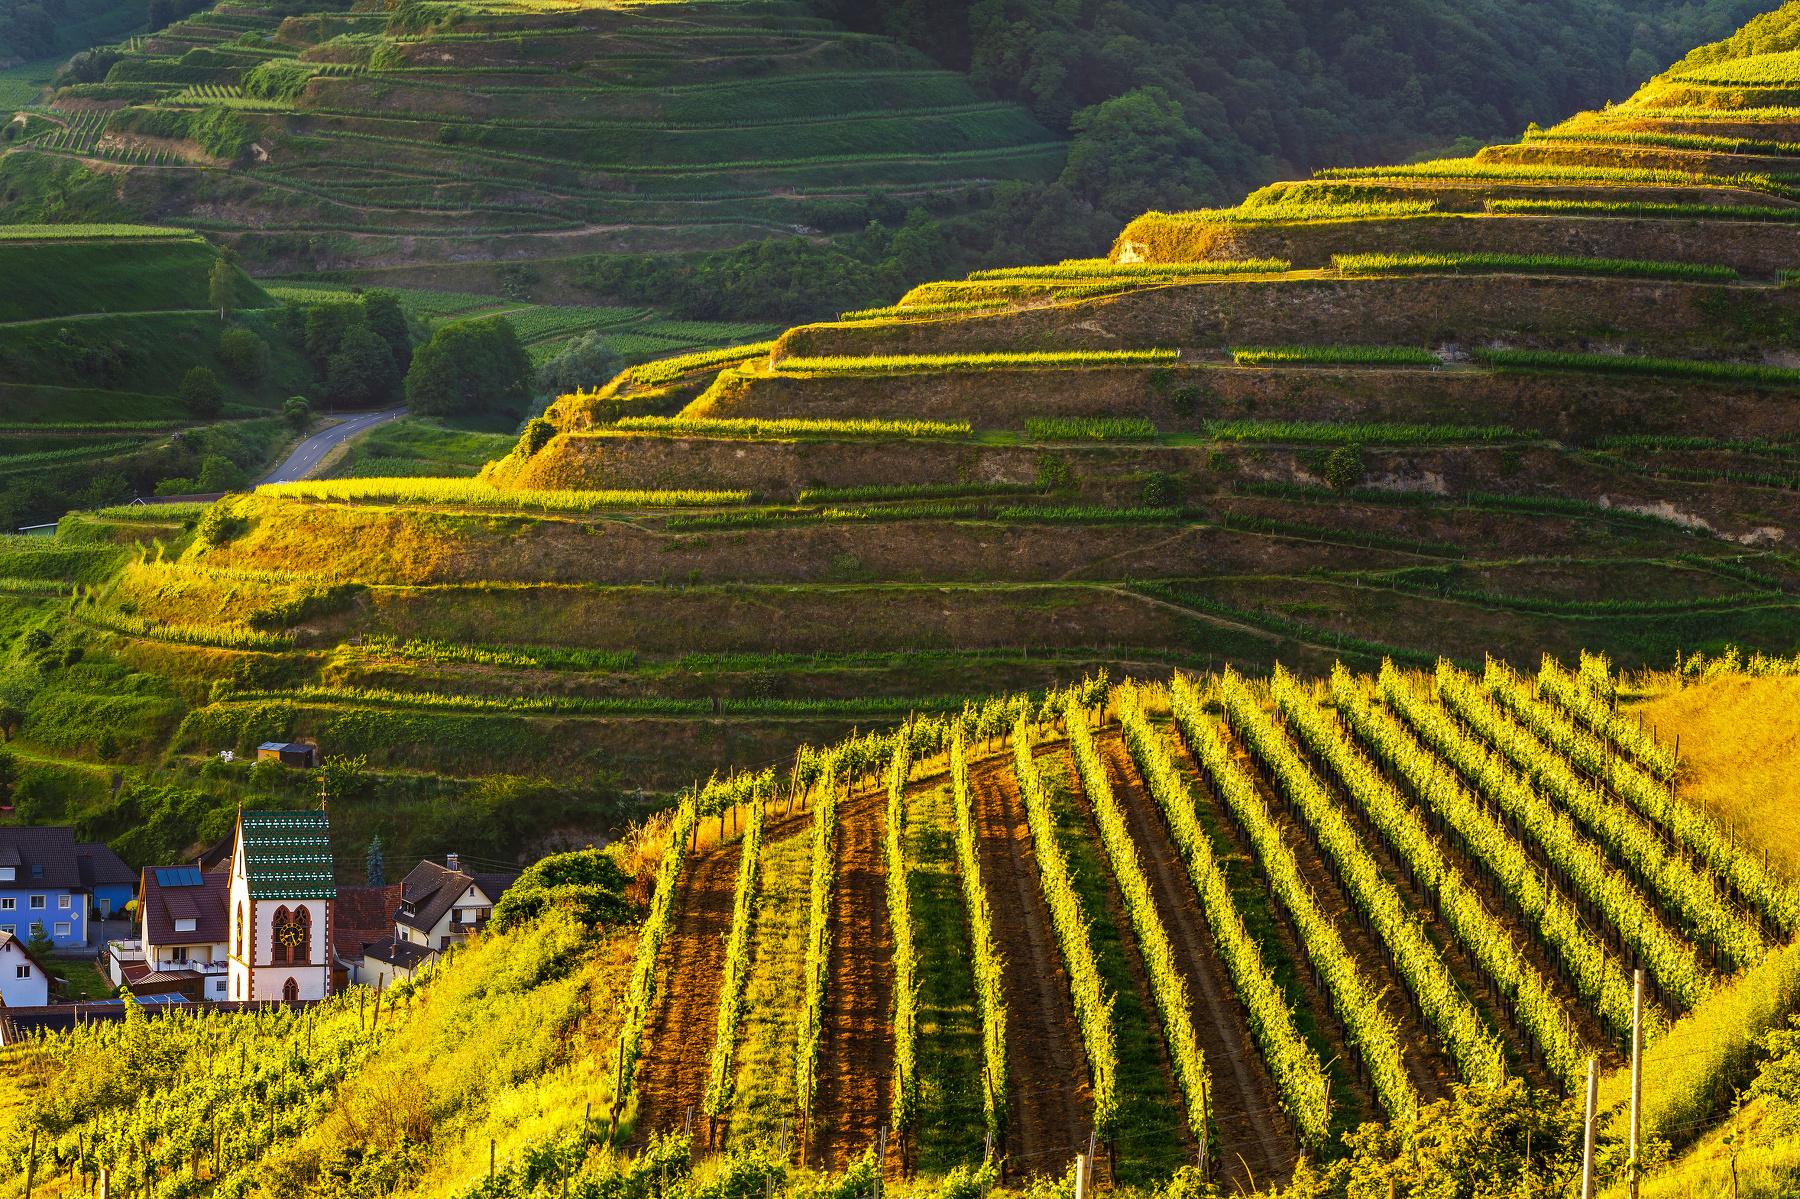 Landschaft am Kaiserstuhl - von Menschenhand geschaffen (Foto: FunnyStudio Fotolia)